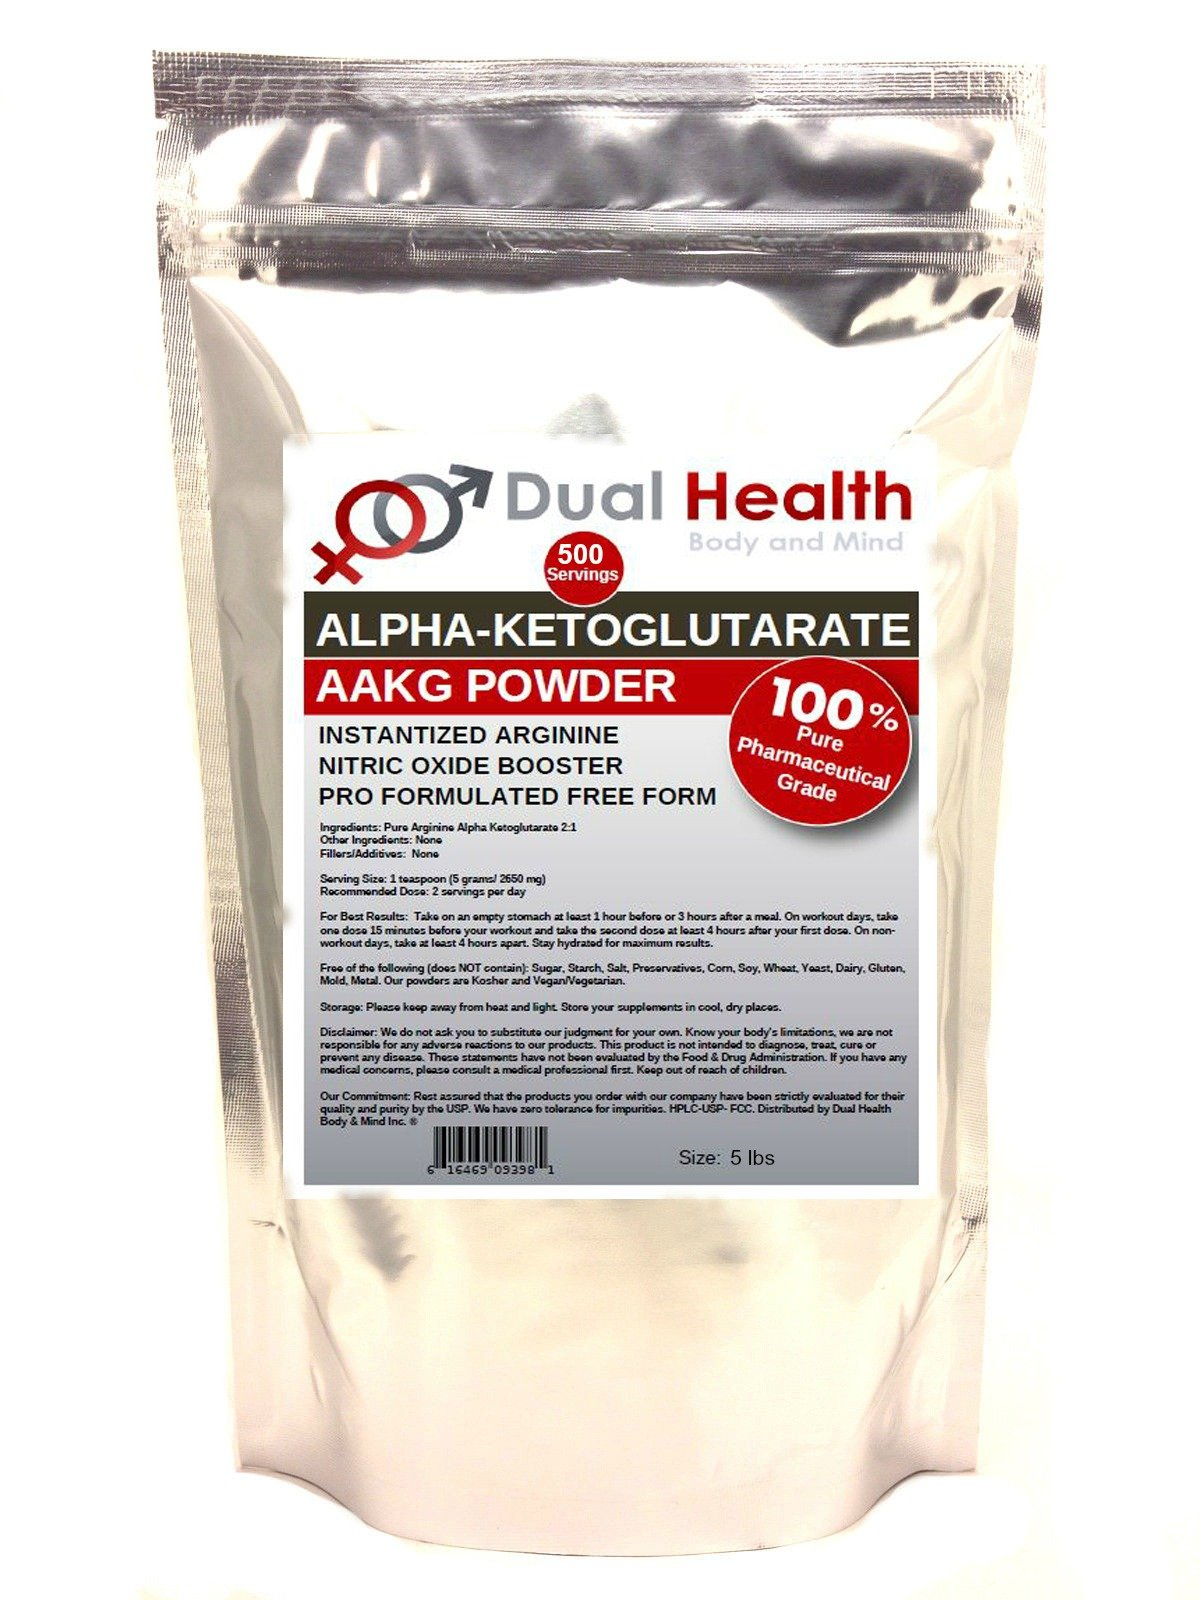 Pure AAKG (5 lbs) L-Arginine Alpha-Ketoglutarate Powder Bulk Supplements